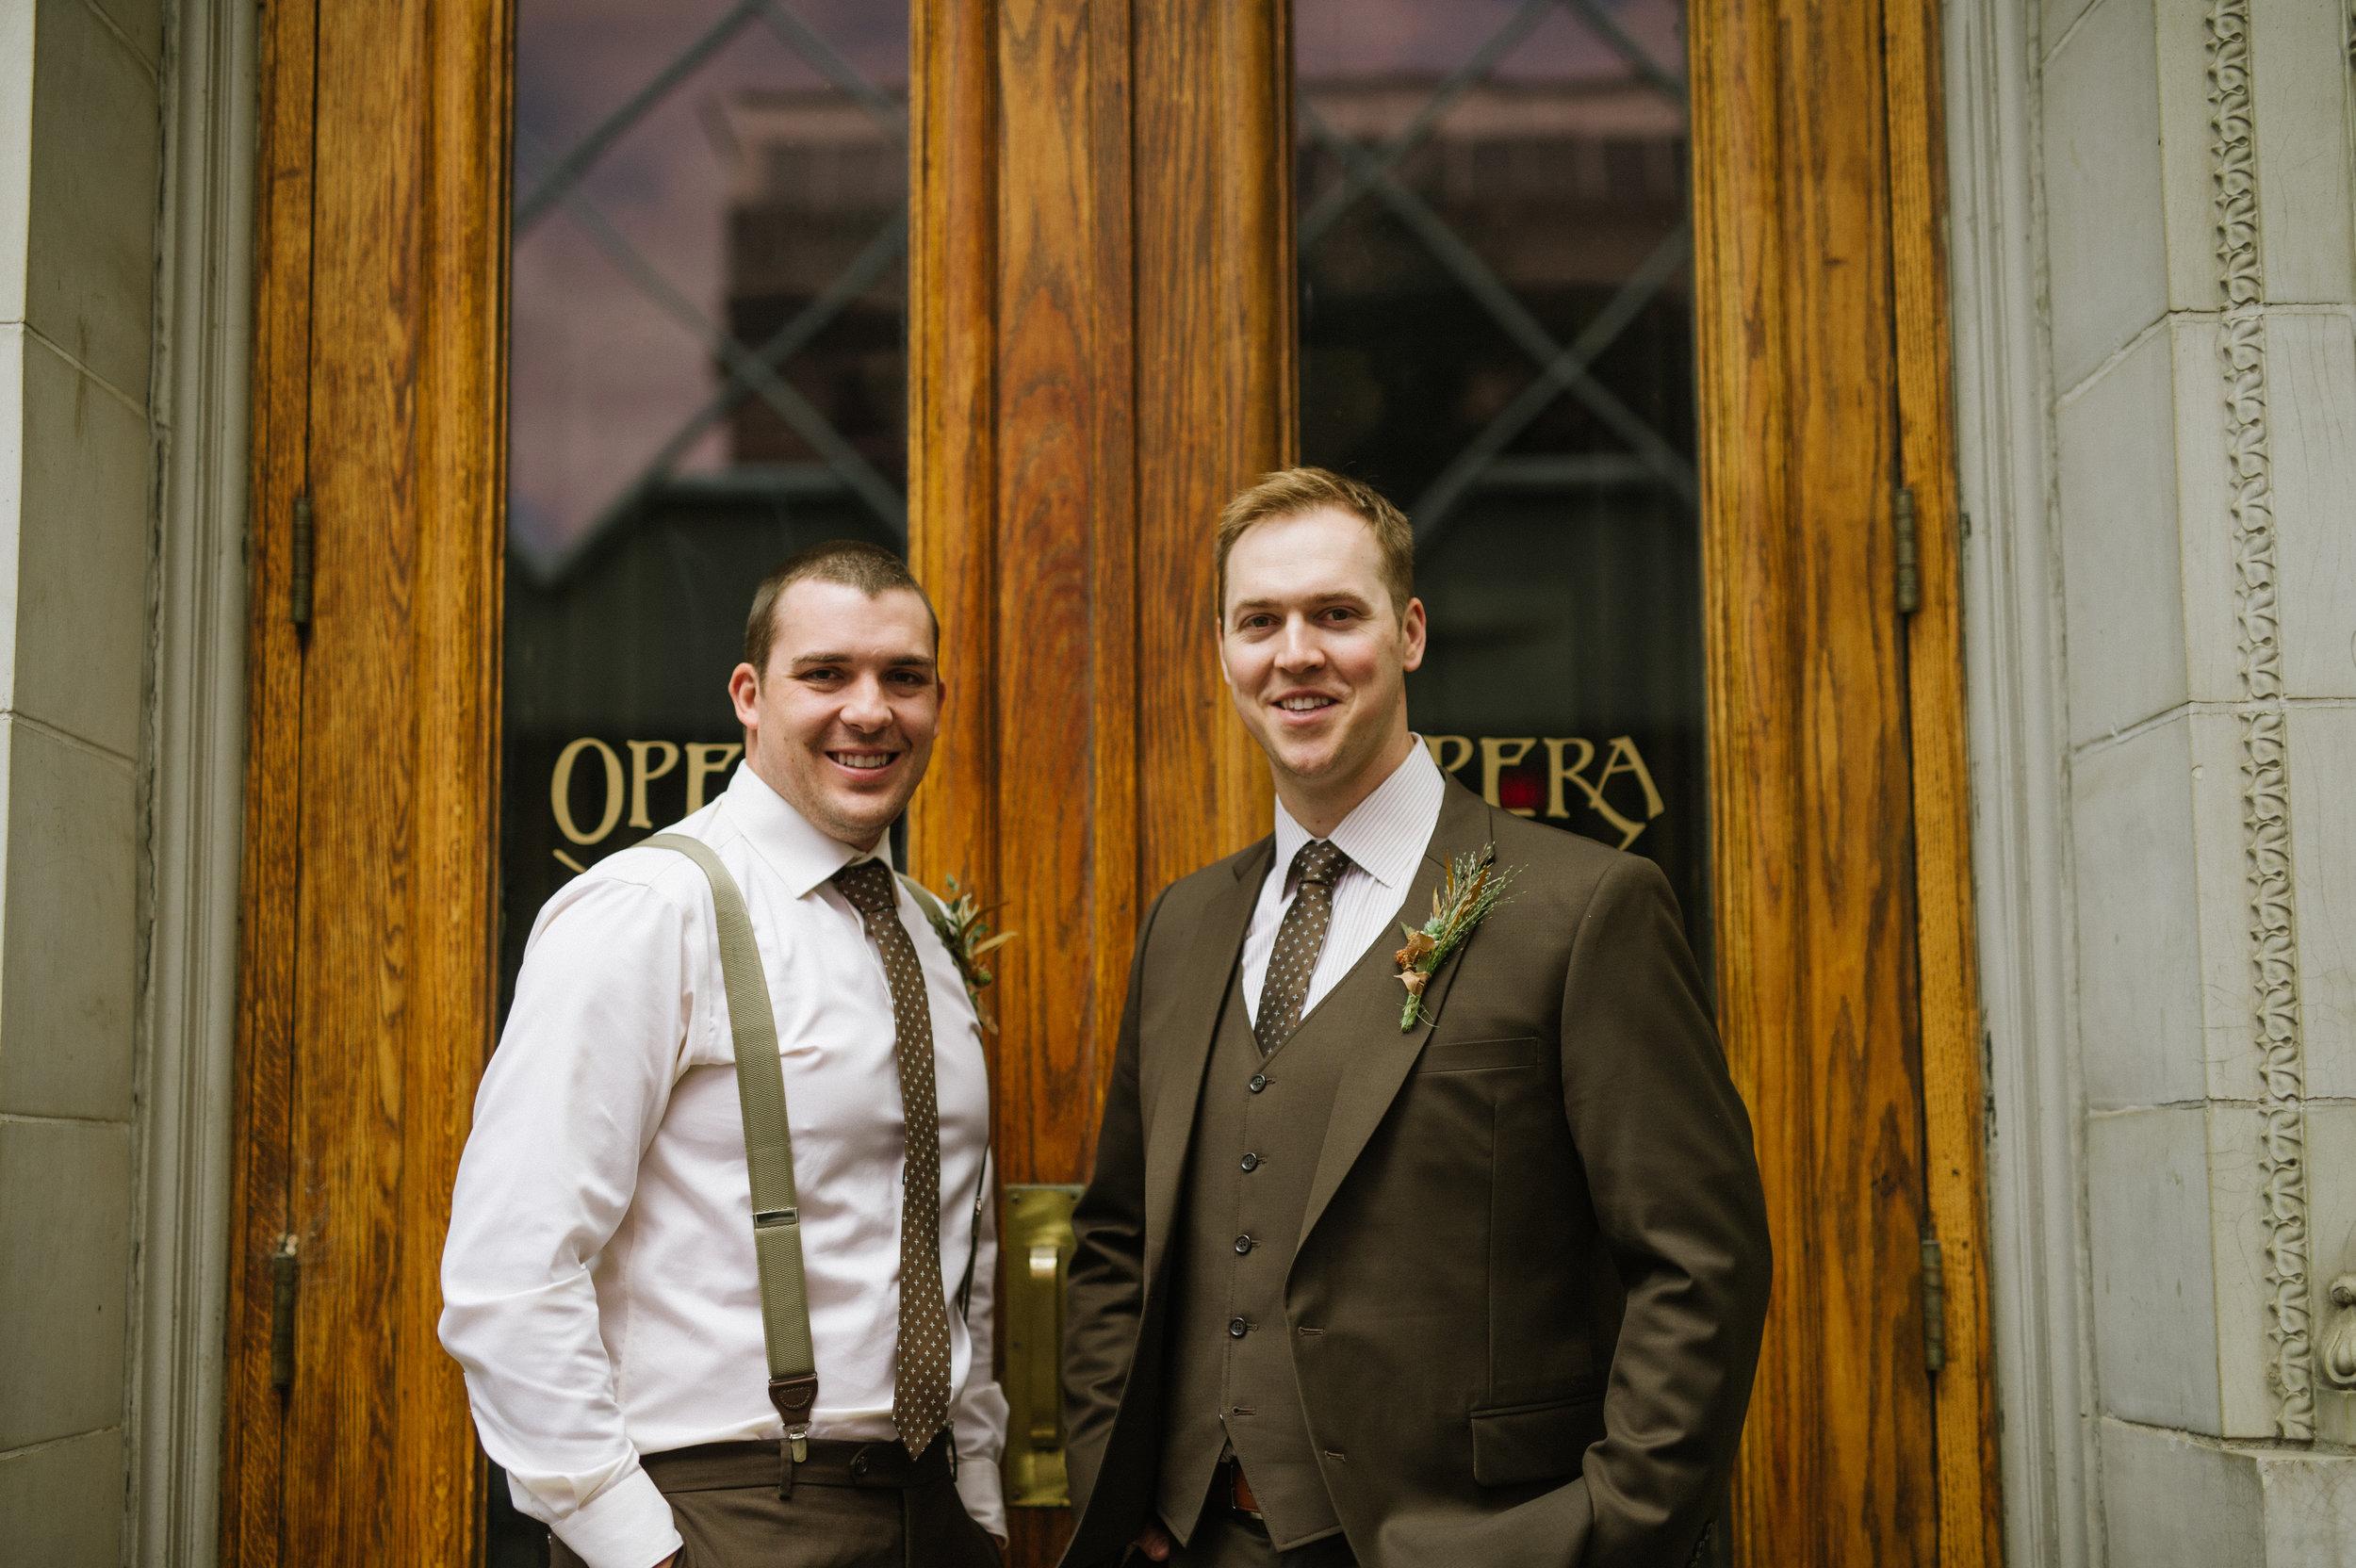 Teatro_Wedding_Calgary_Wedding_Photography_Vanessa_Tom_Married_2018_HR013.jpg